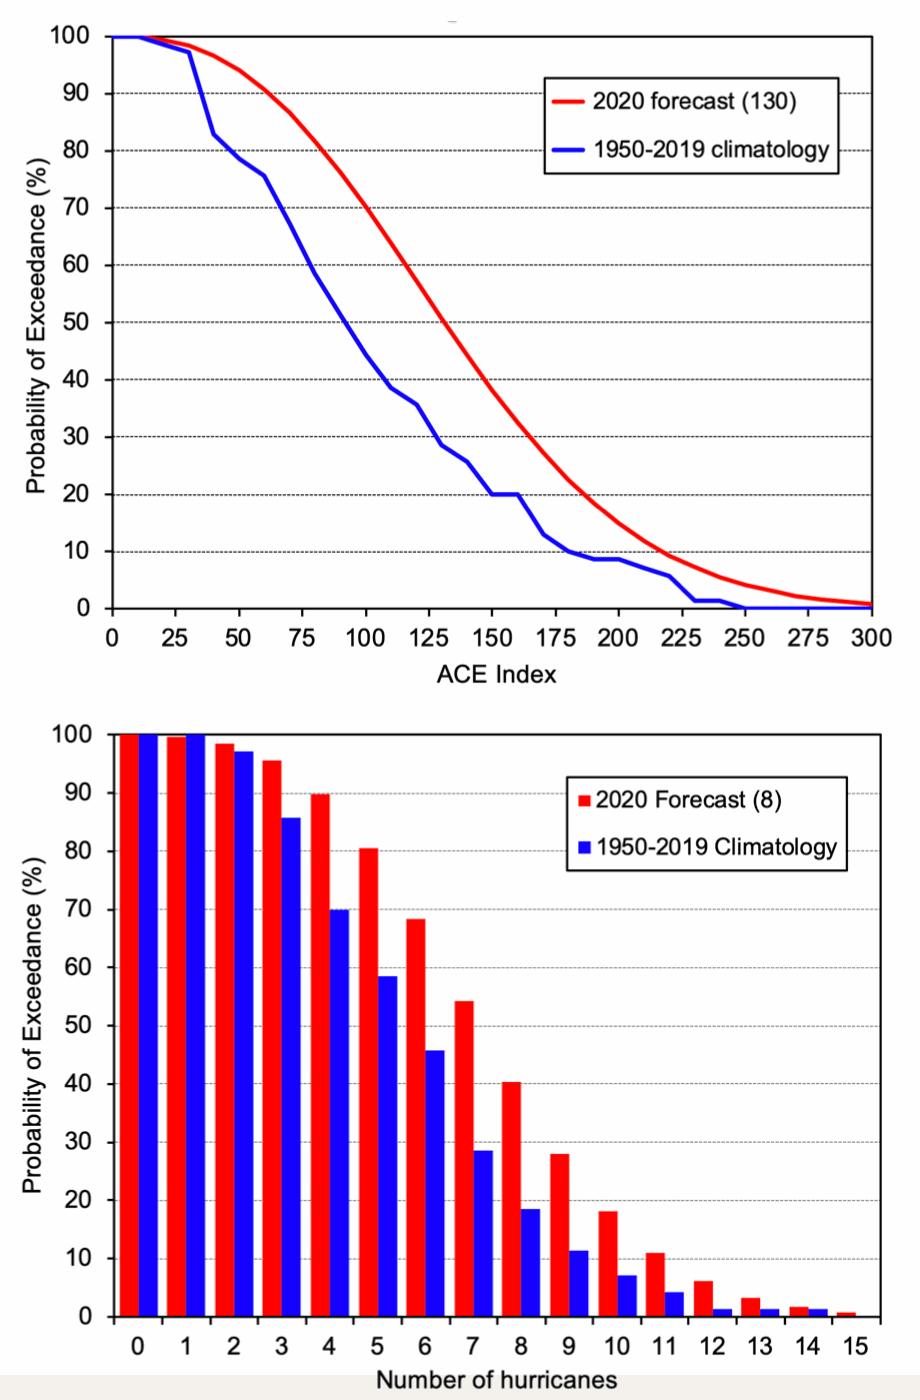 hurricane-forecast-2020-probabilities